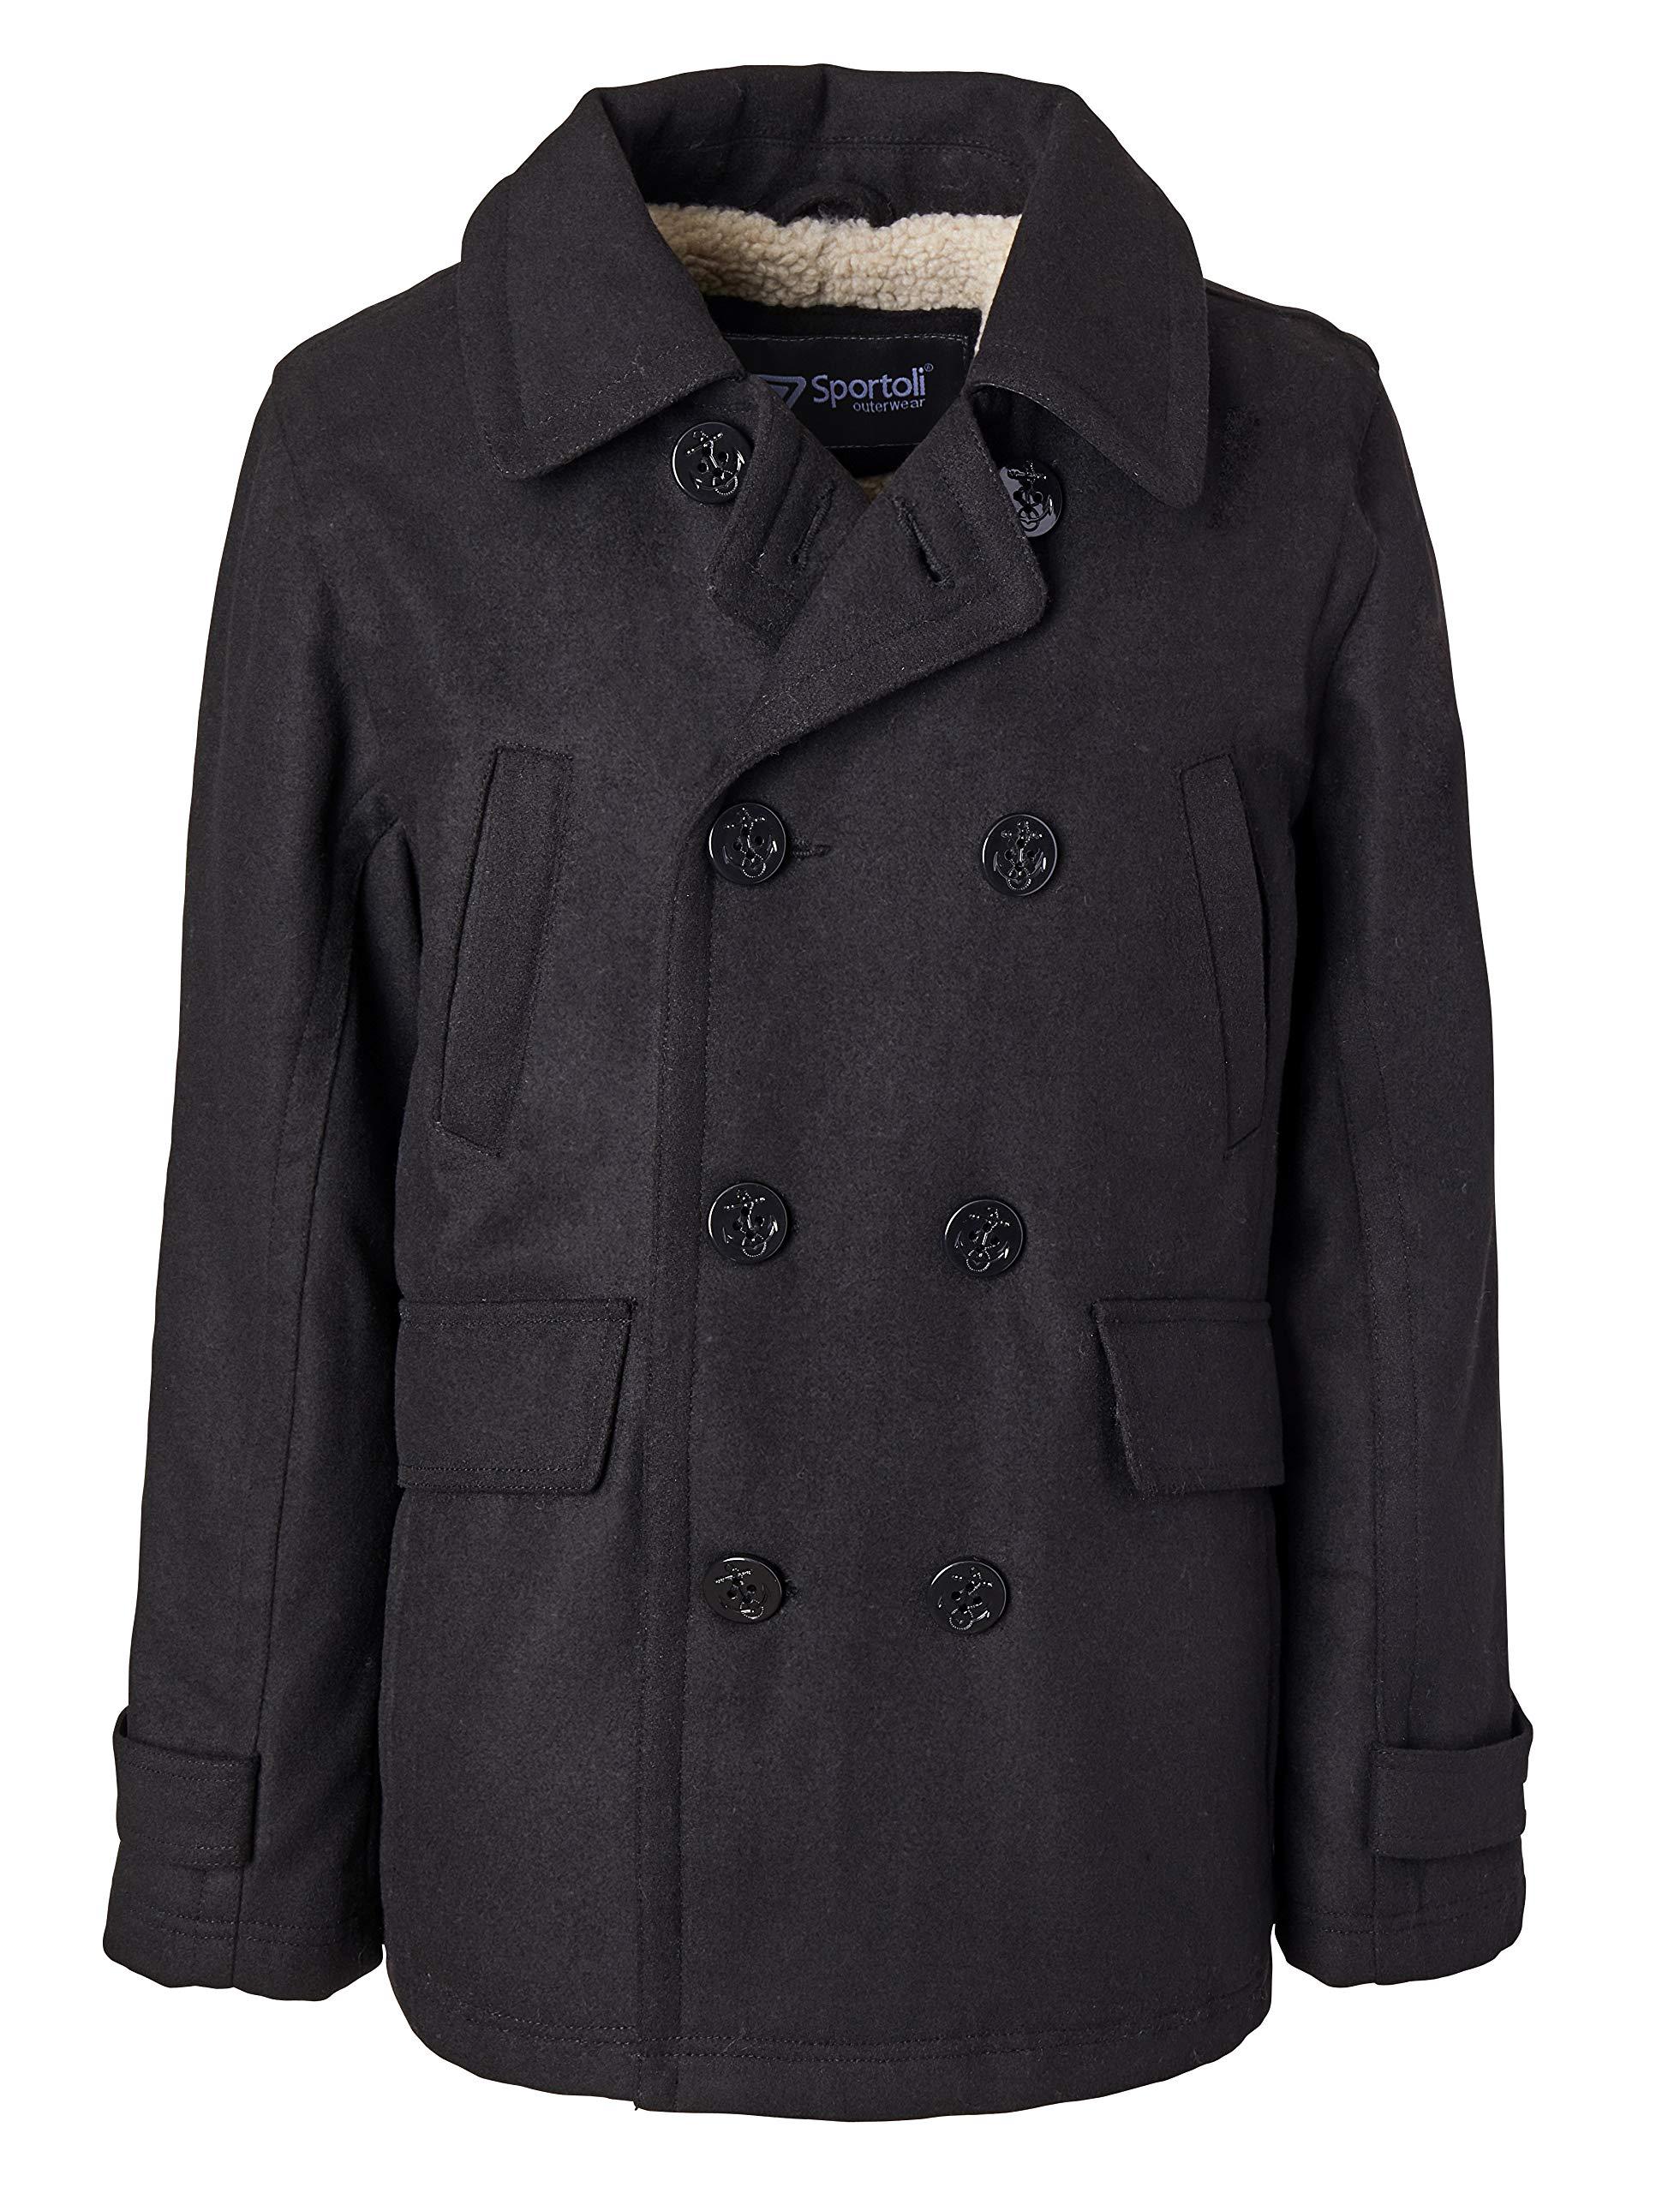 Sportoli Boy Classic Wool Blend Sherpa Winter Dress Pea Coat Peacoat Jacket - Black (Size 18/20)